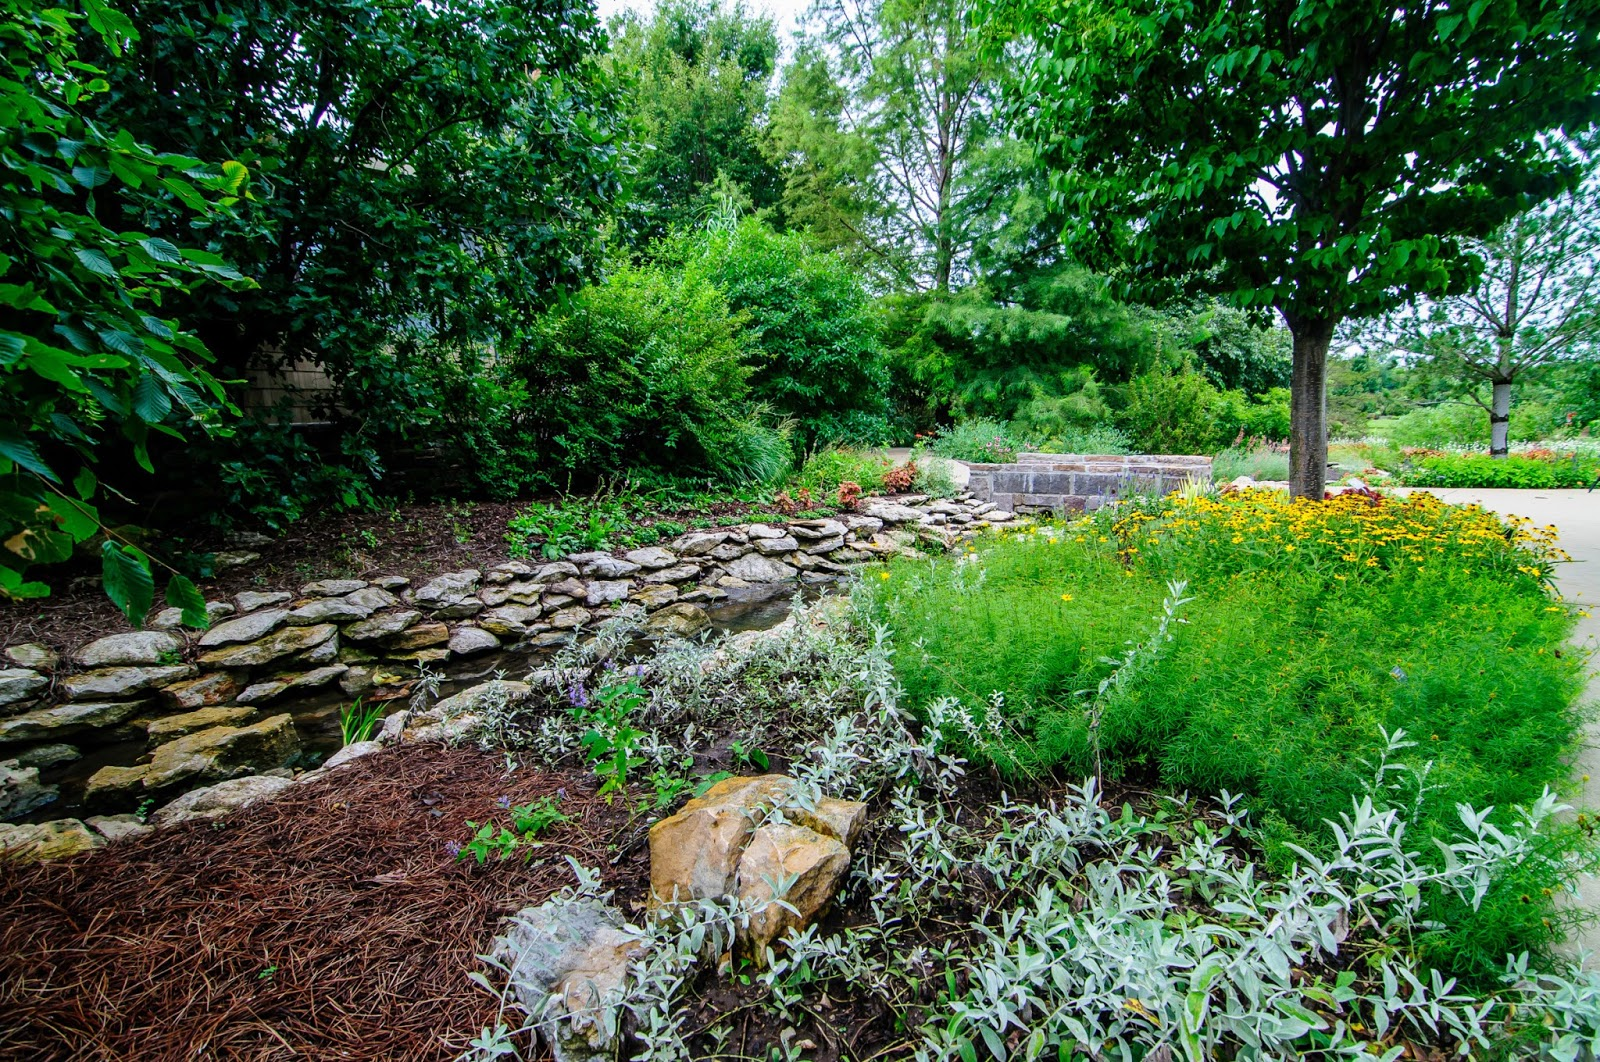 Arboretum Botanical Gardens, Overland Park, Kansas